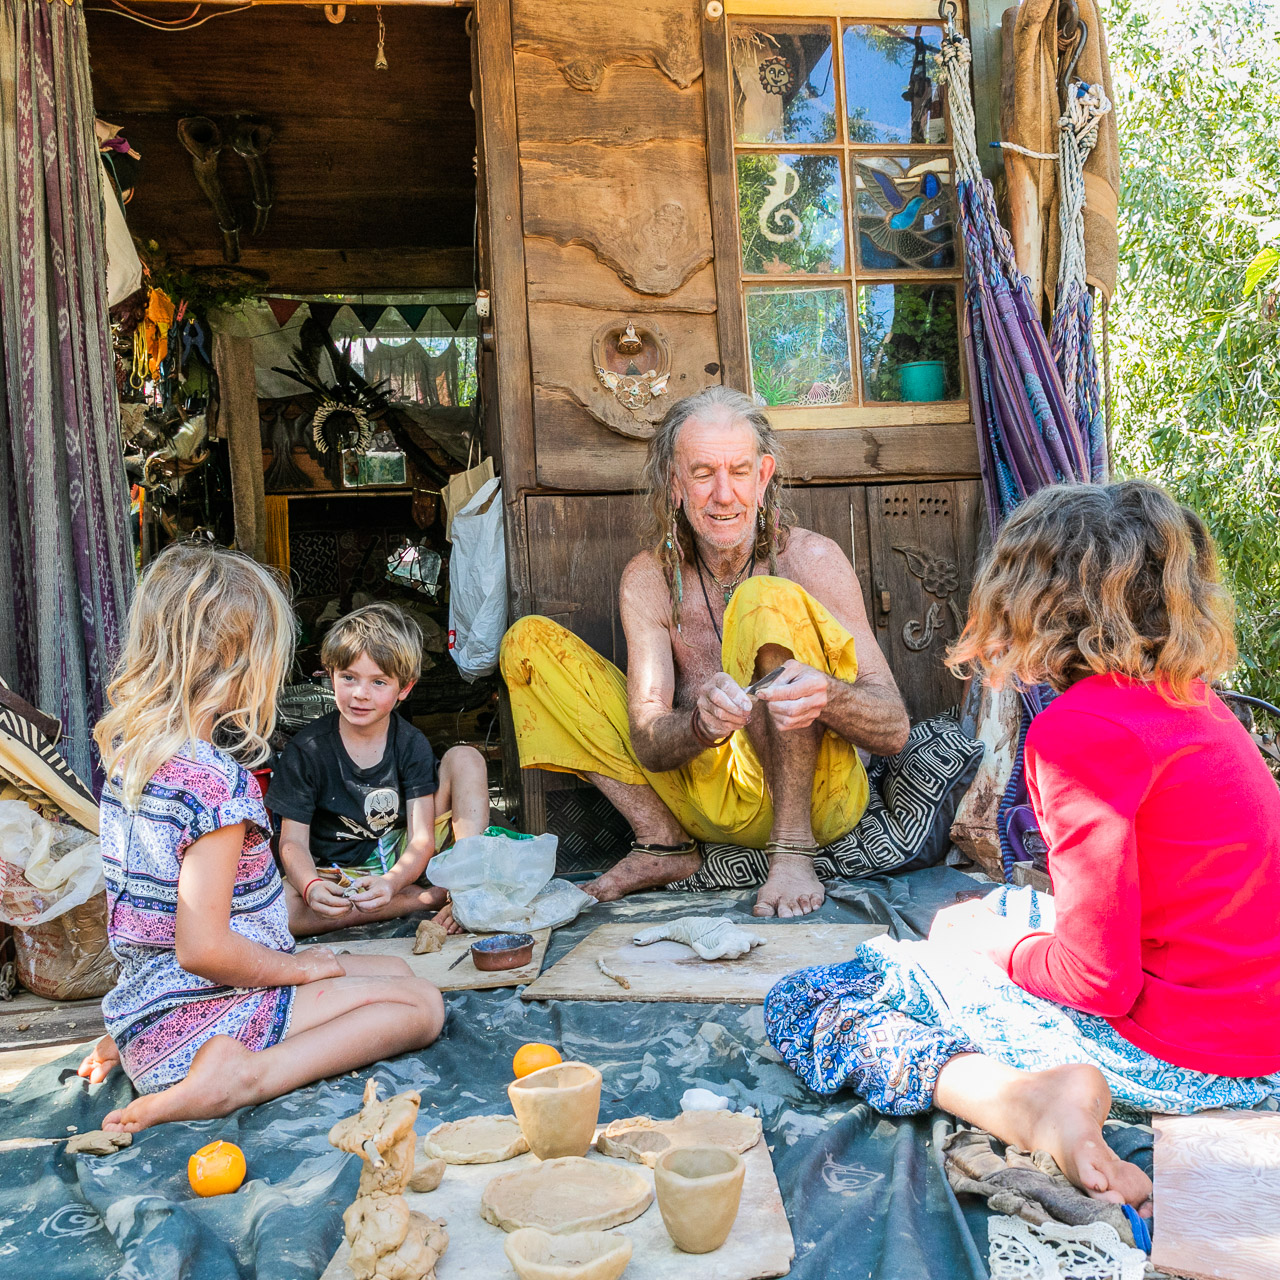 Nomadics-Tribe-and-Kamali-in-Broome-02.jpg